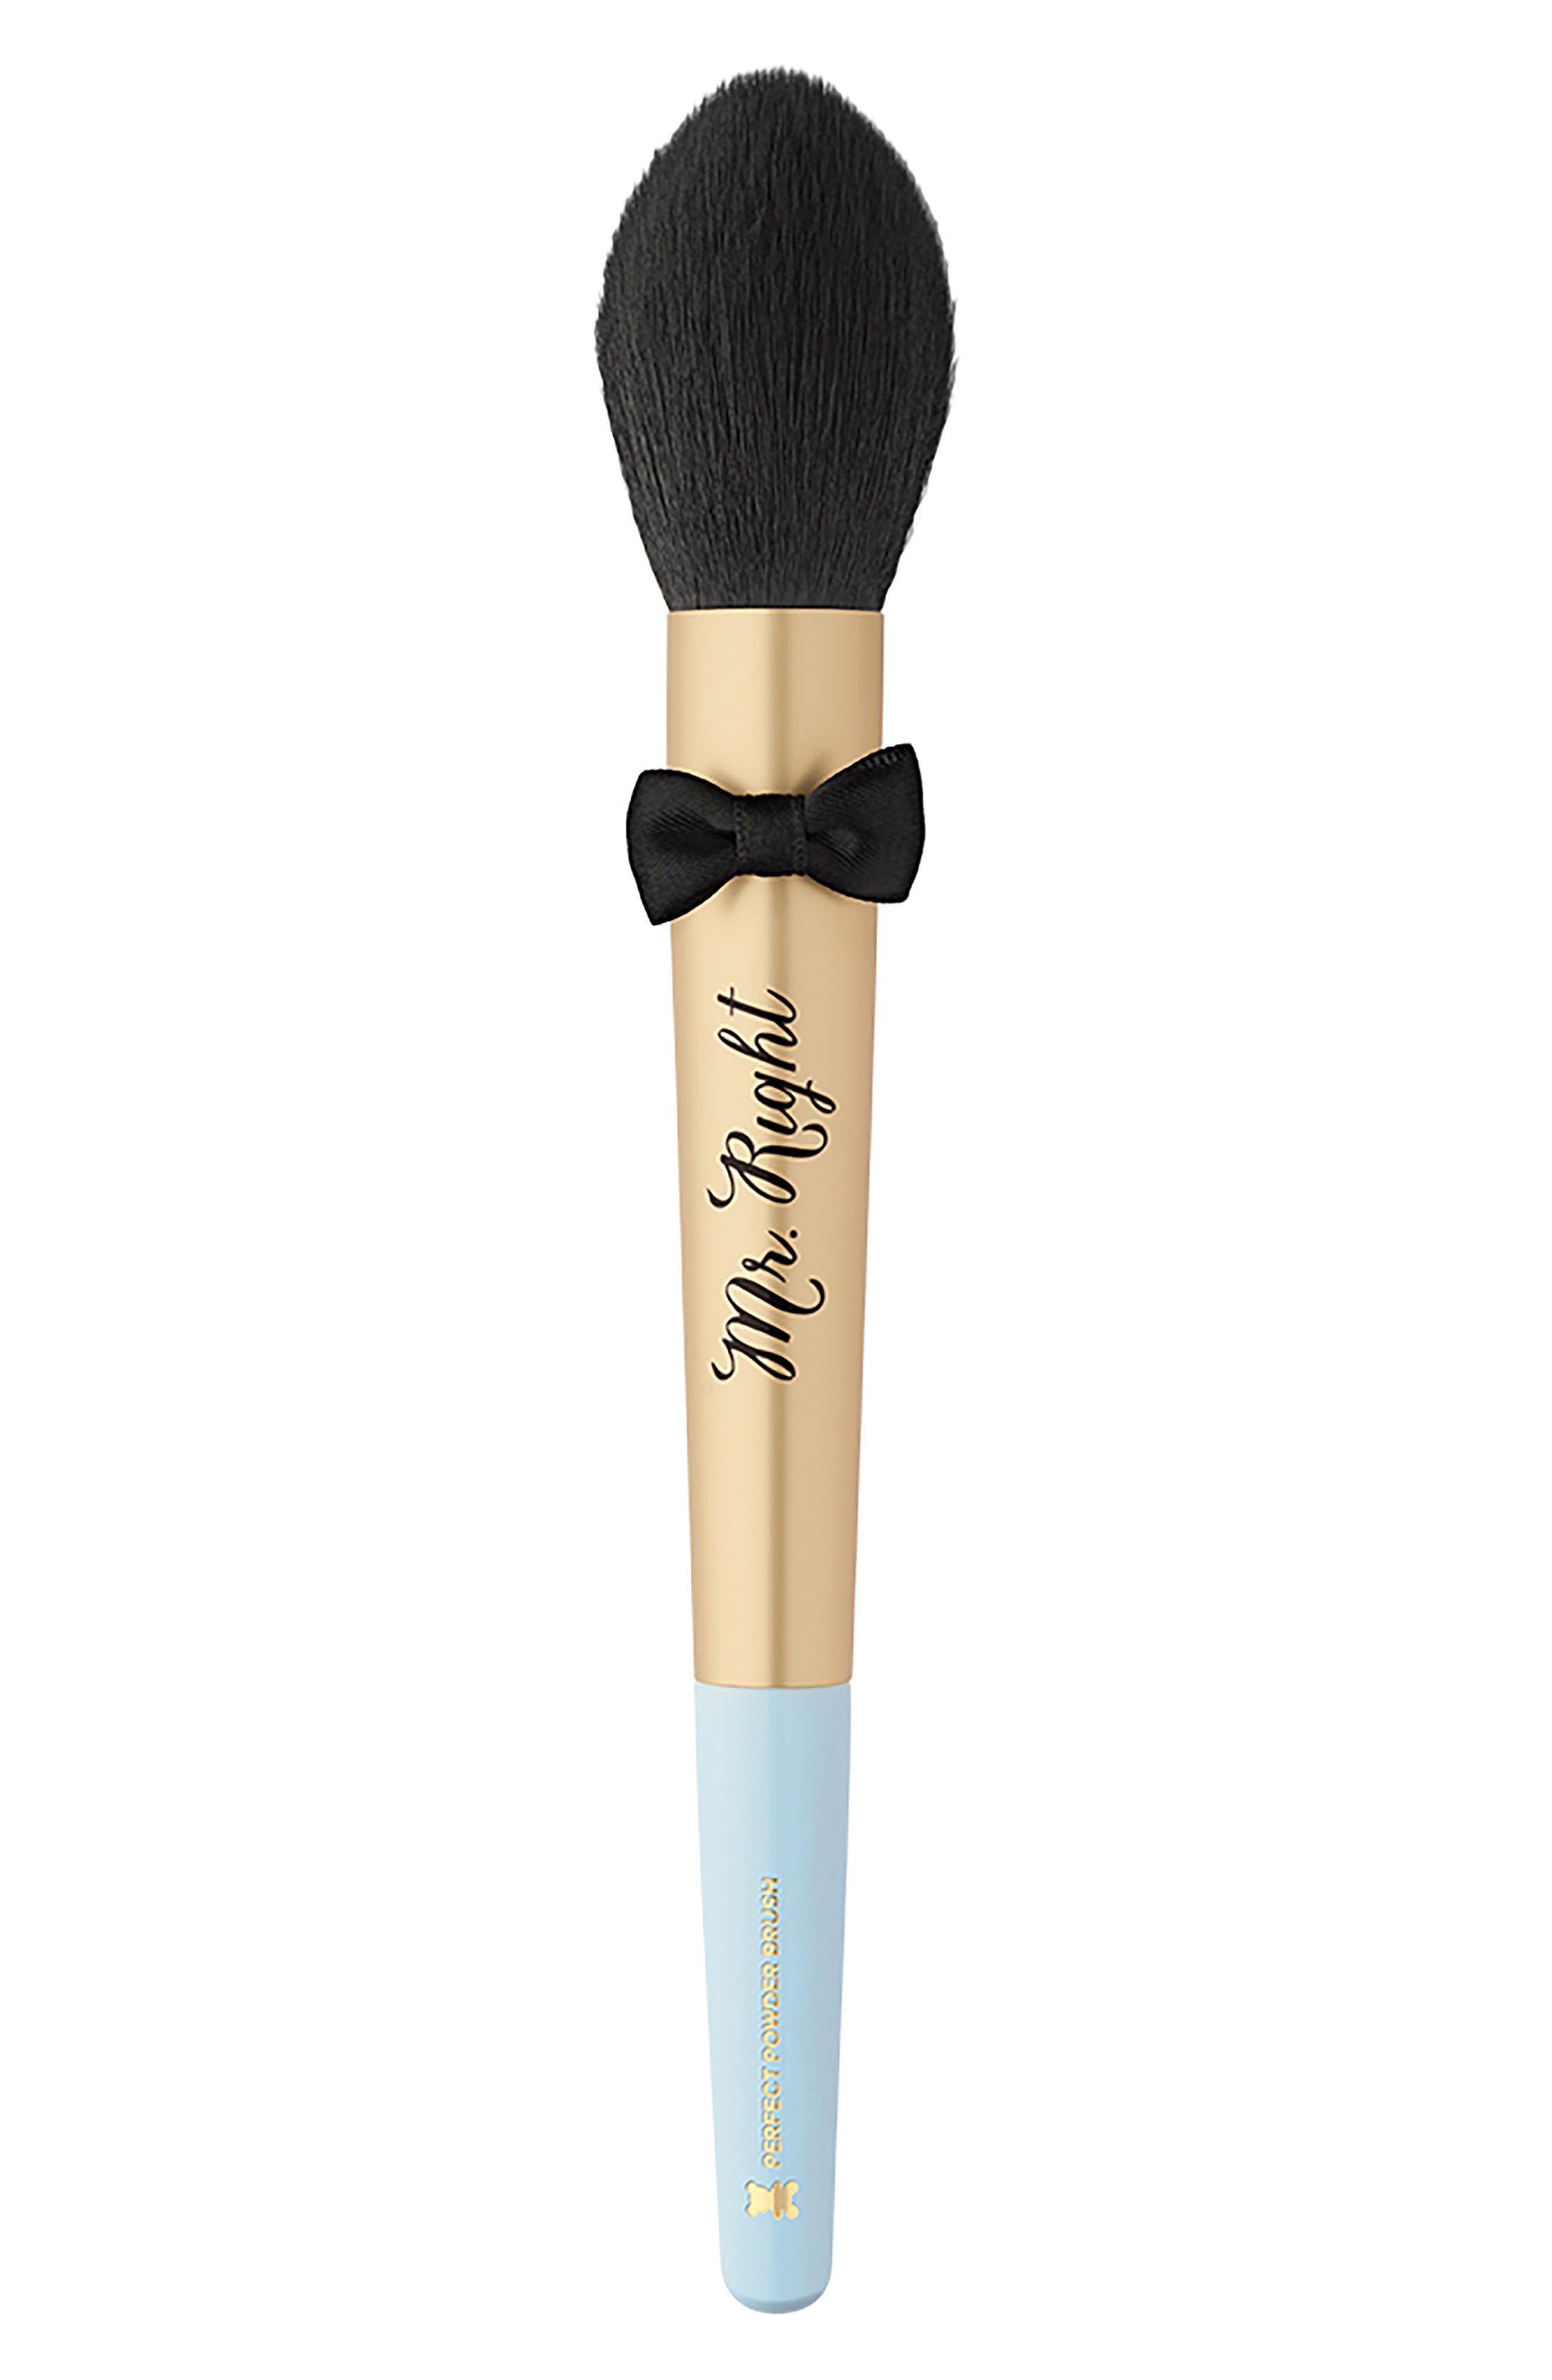 Mr. Right Powder Brush,                         Main,                         color, No Color